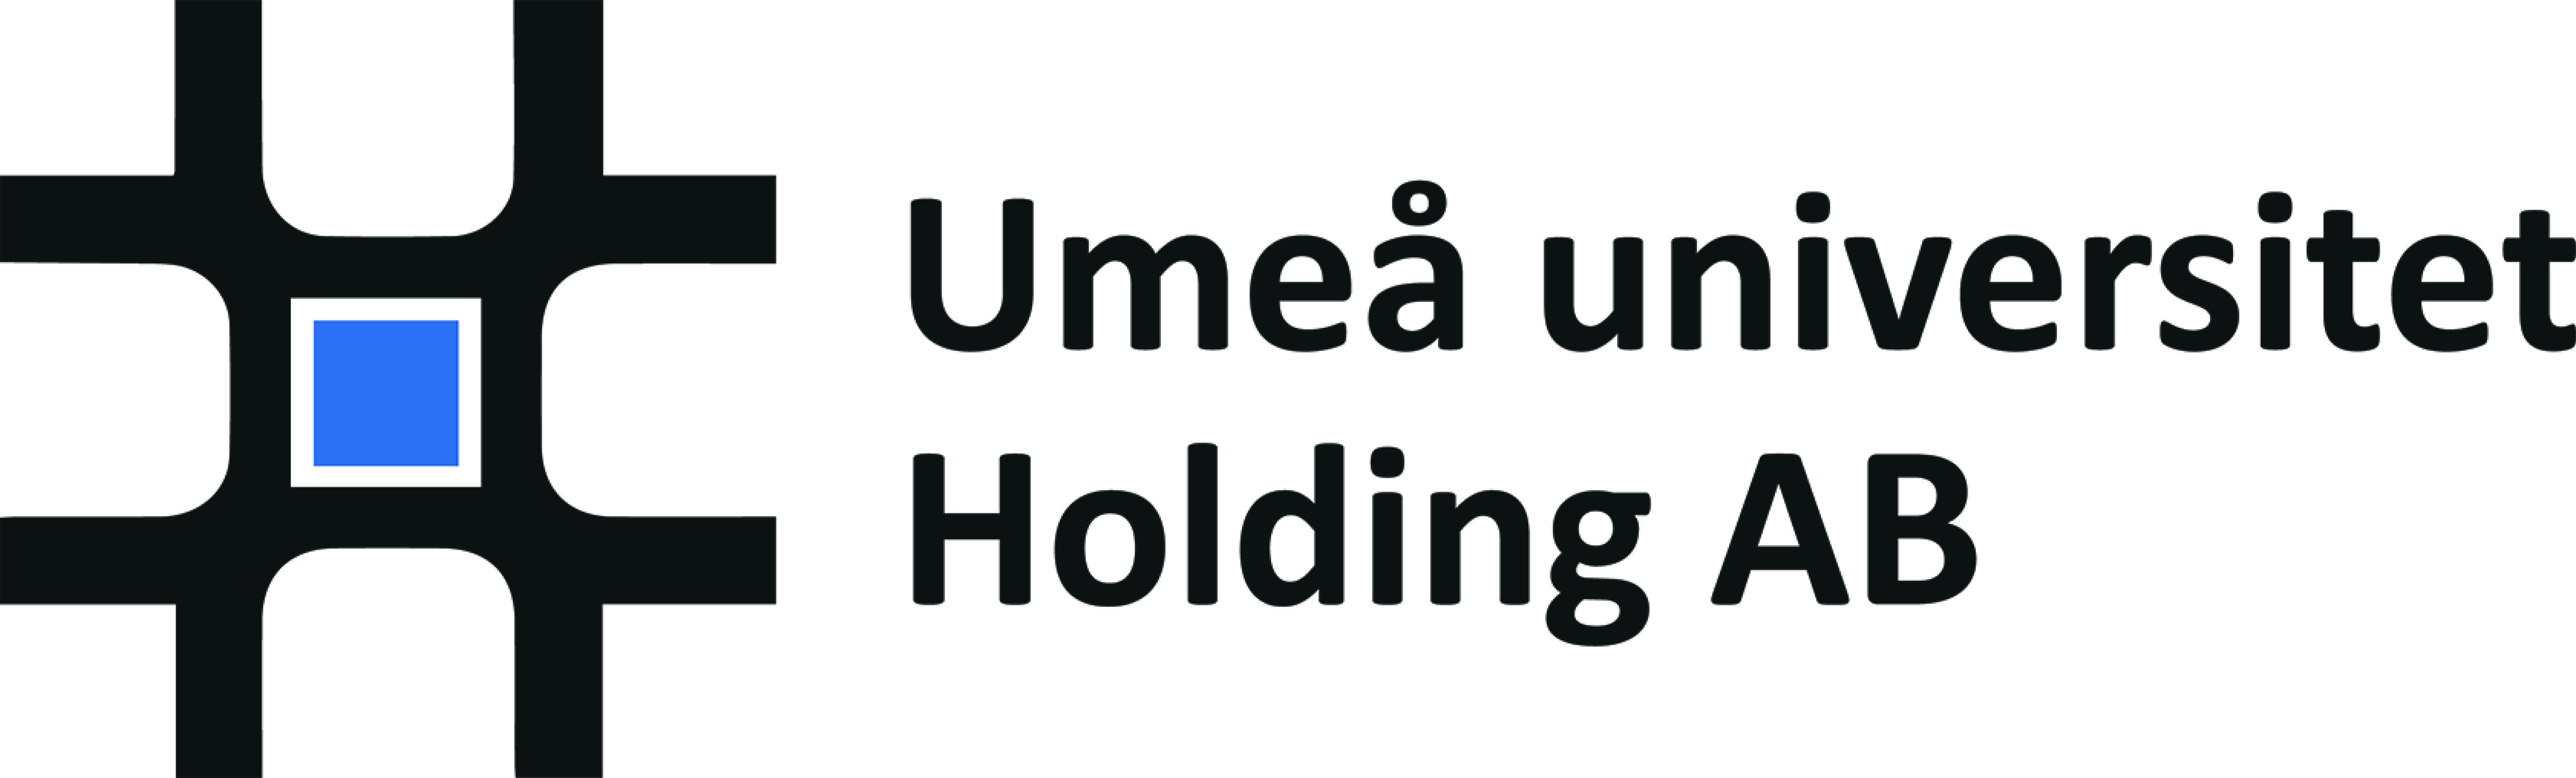 Umeå universitet Holding